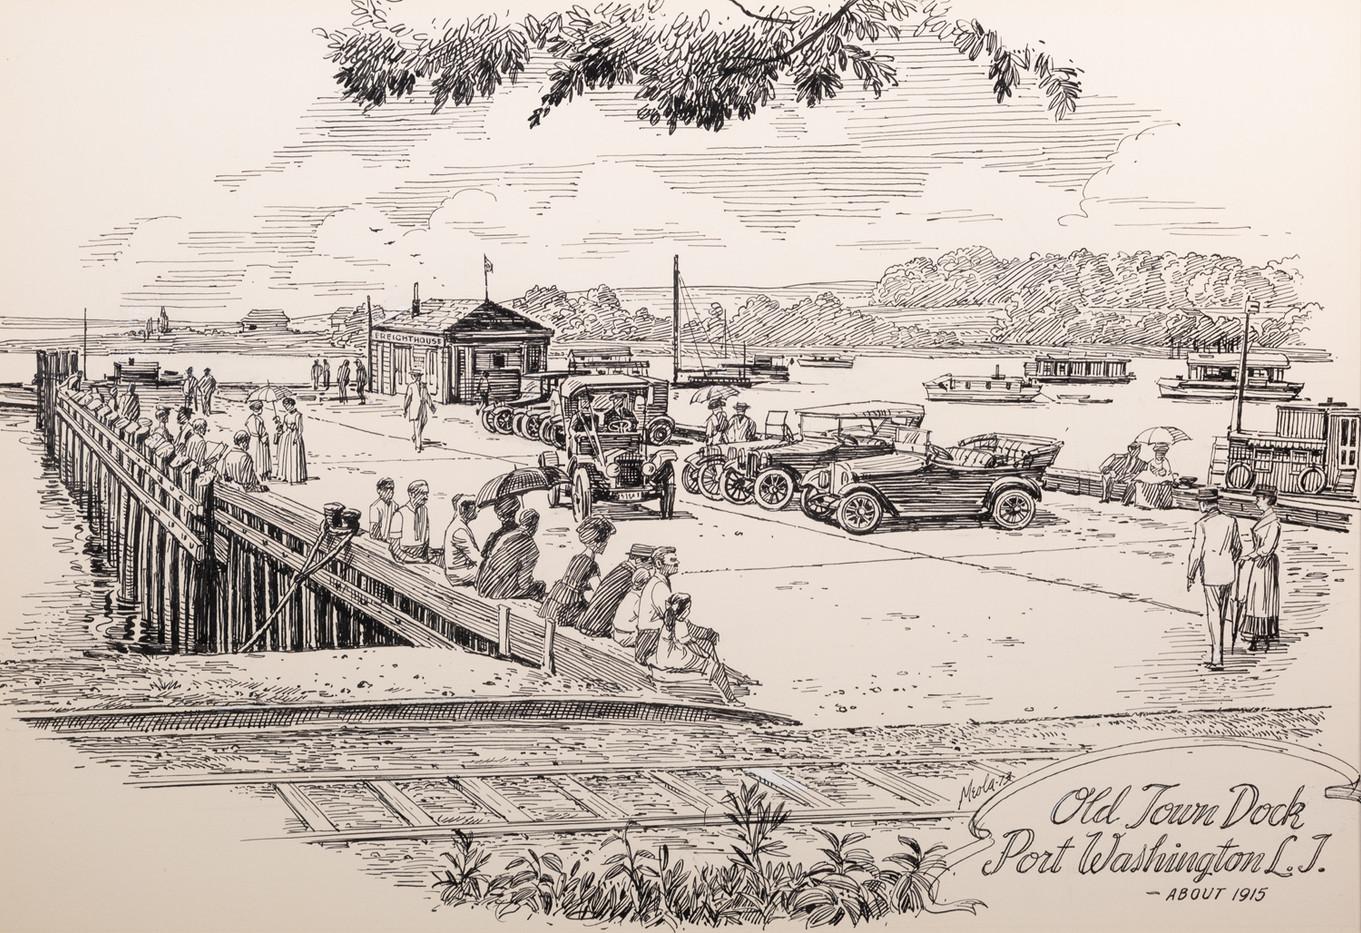 Old Town Dock, Port Washington, circa 1915